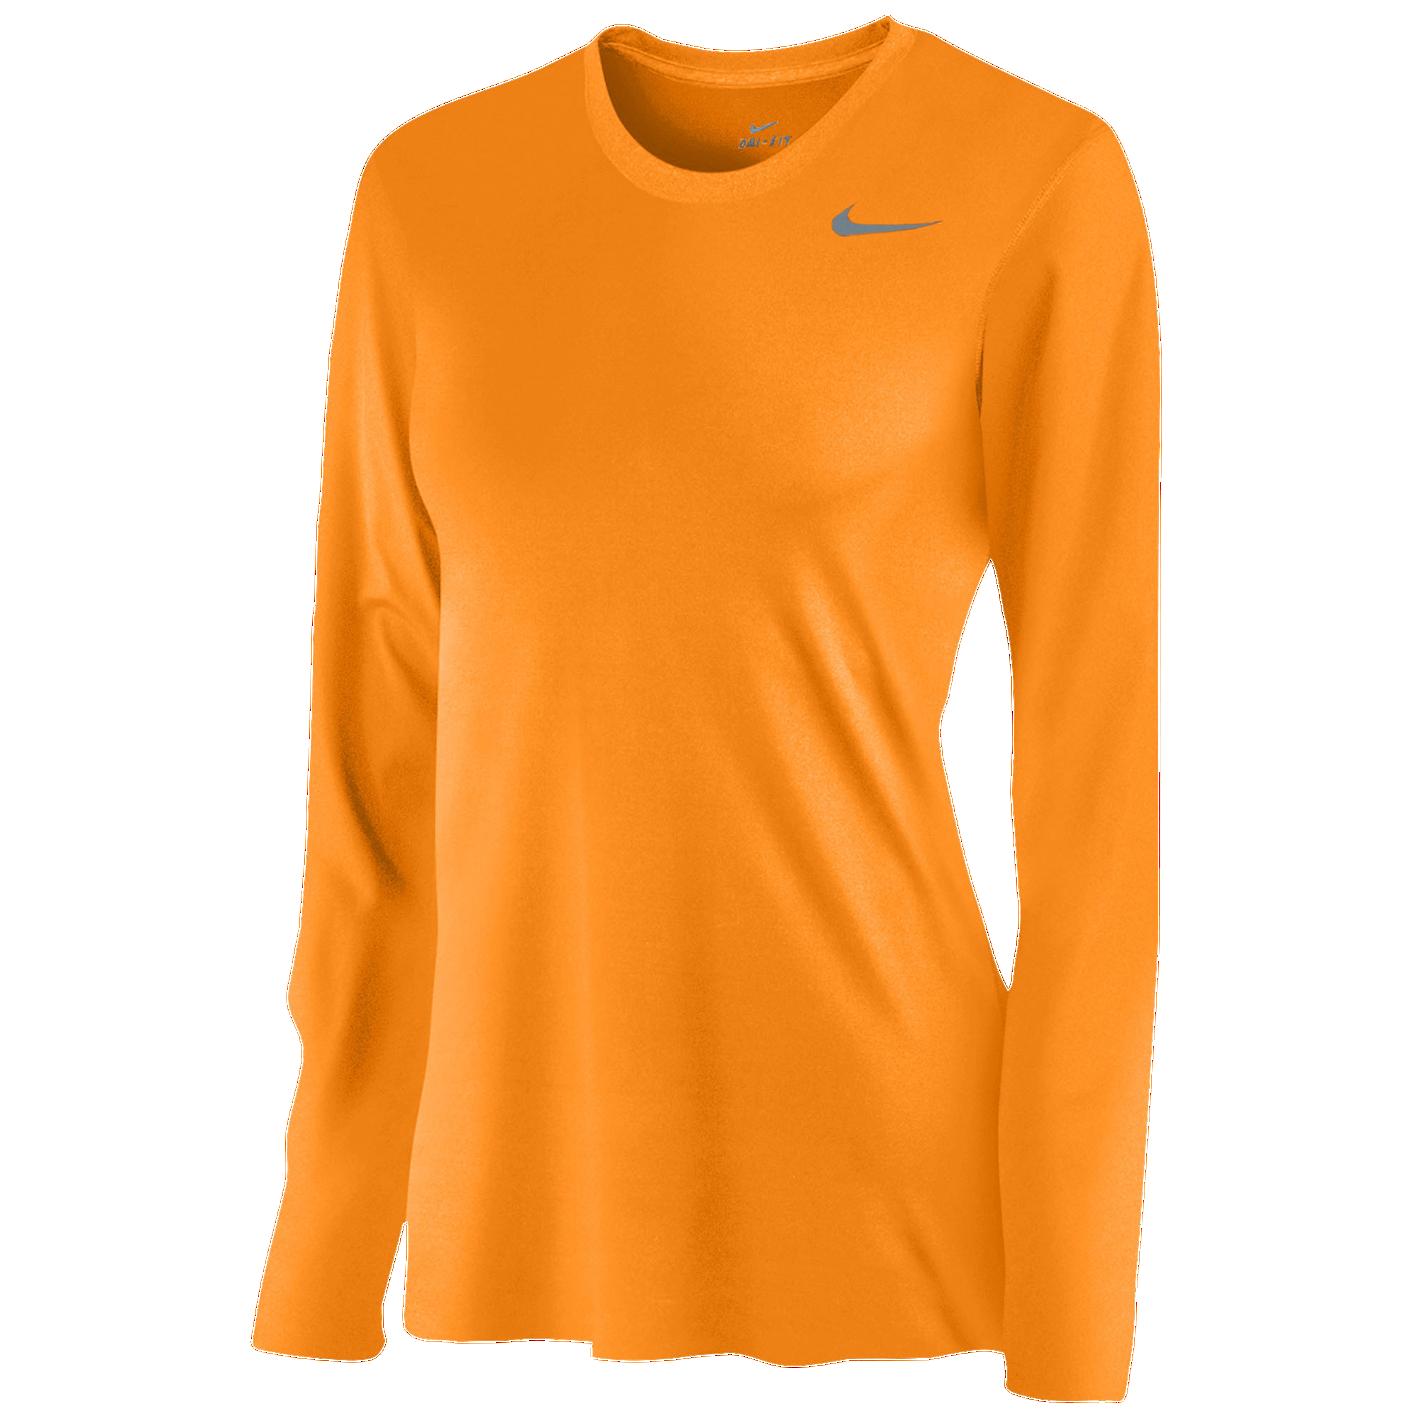 Nike Team Legend Long Sleeve T Shirt Womens Training Clothing